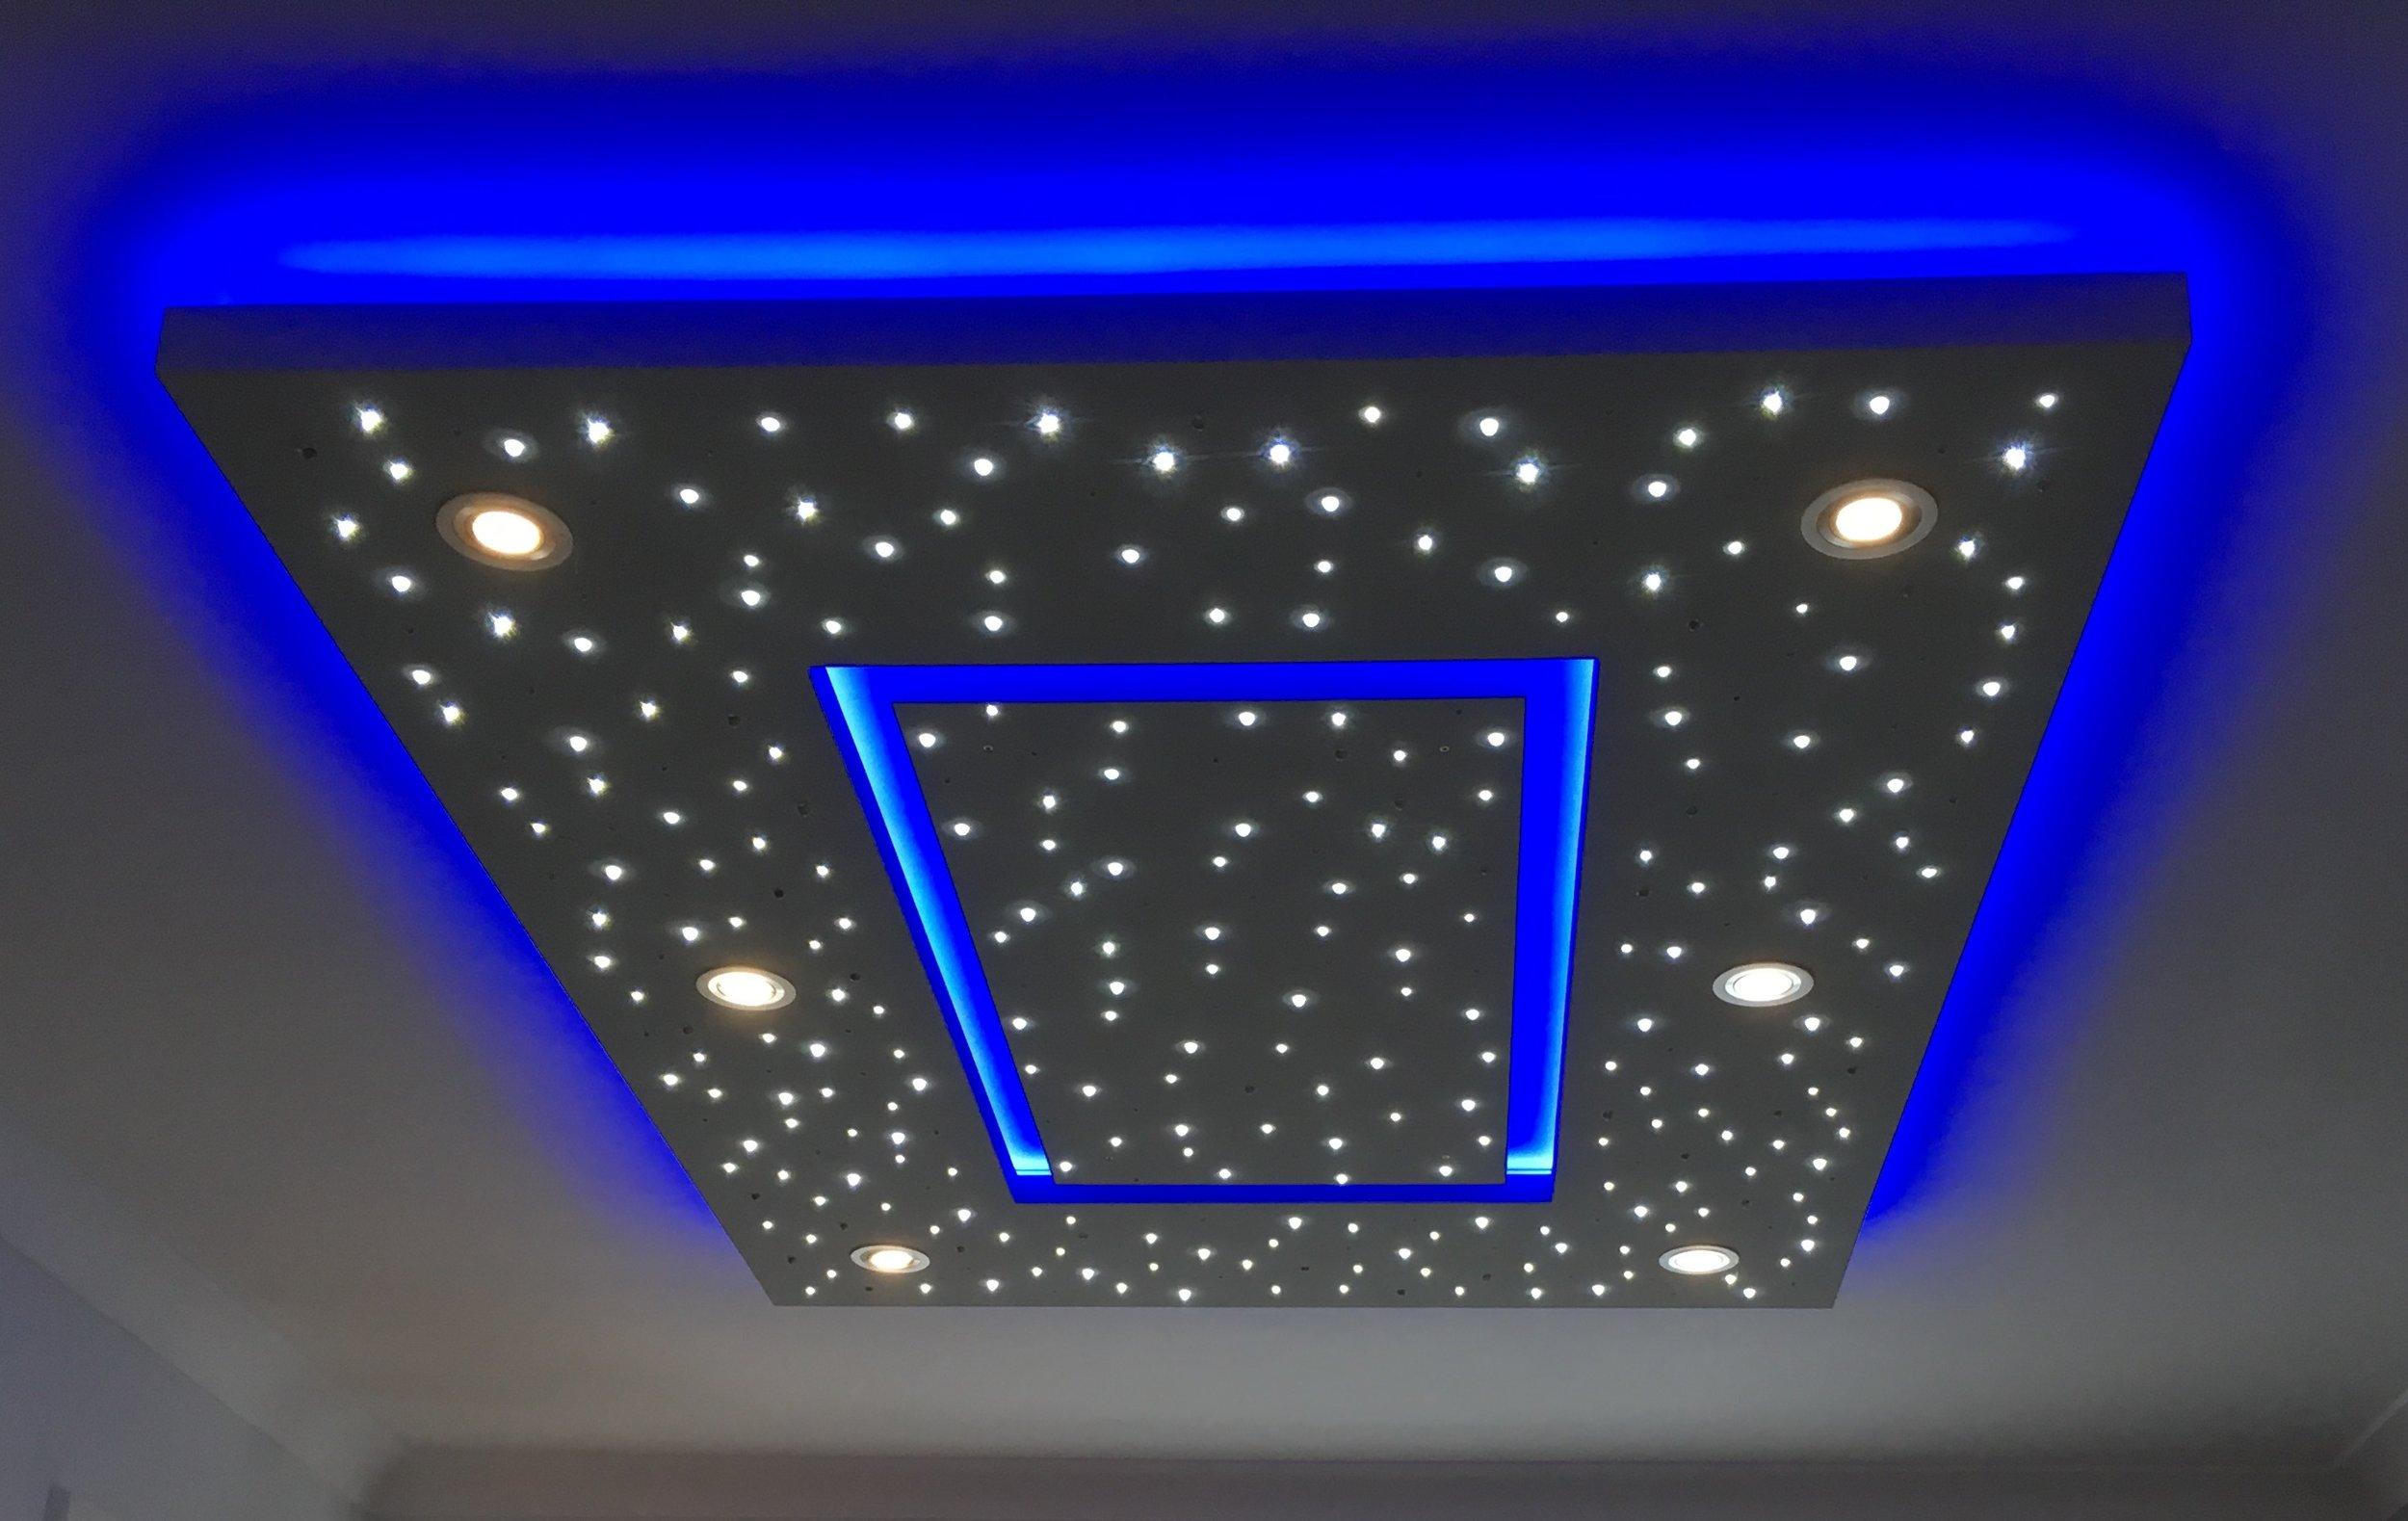 Star Ceiling in Living room, spotlights on